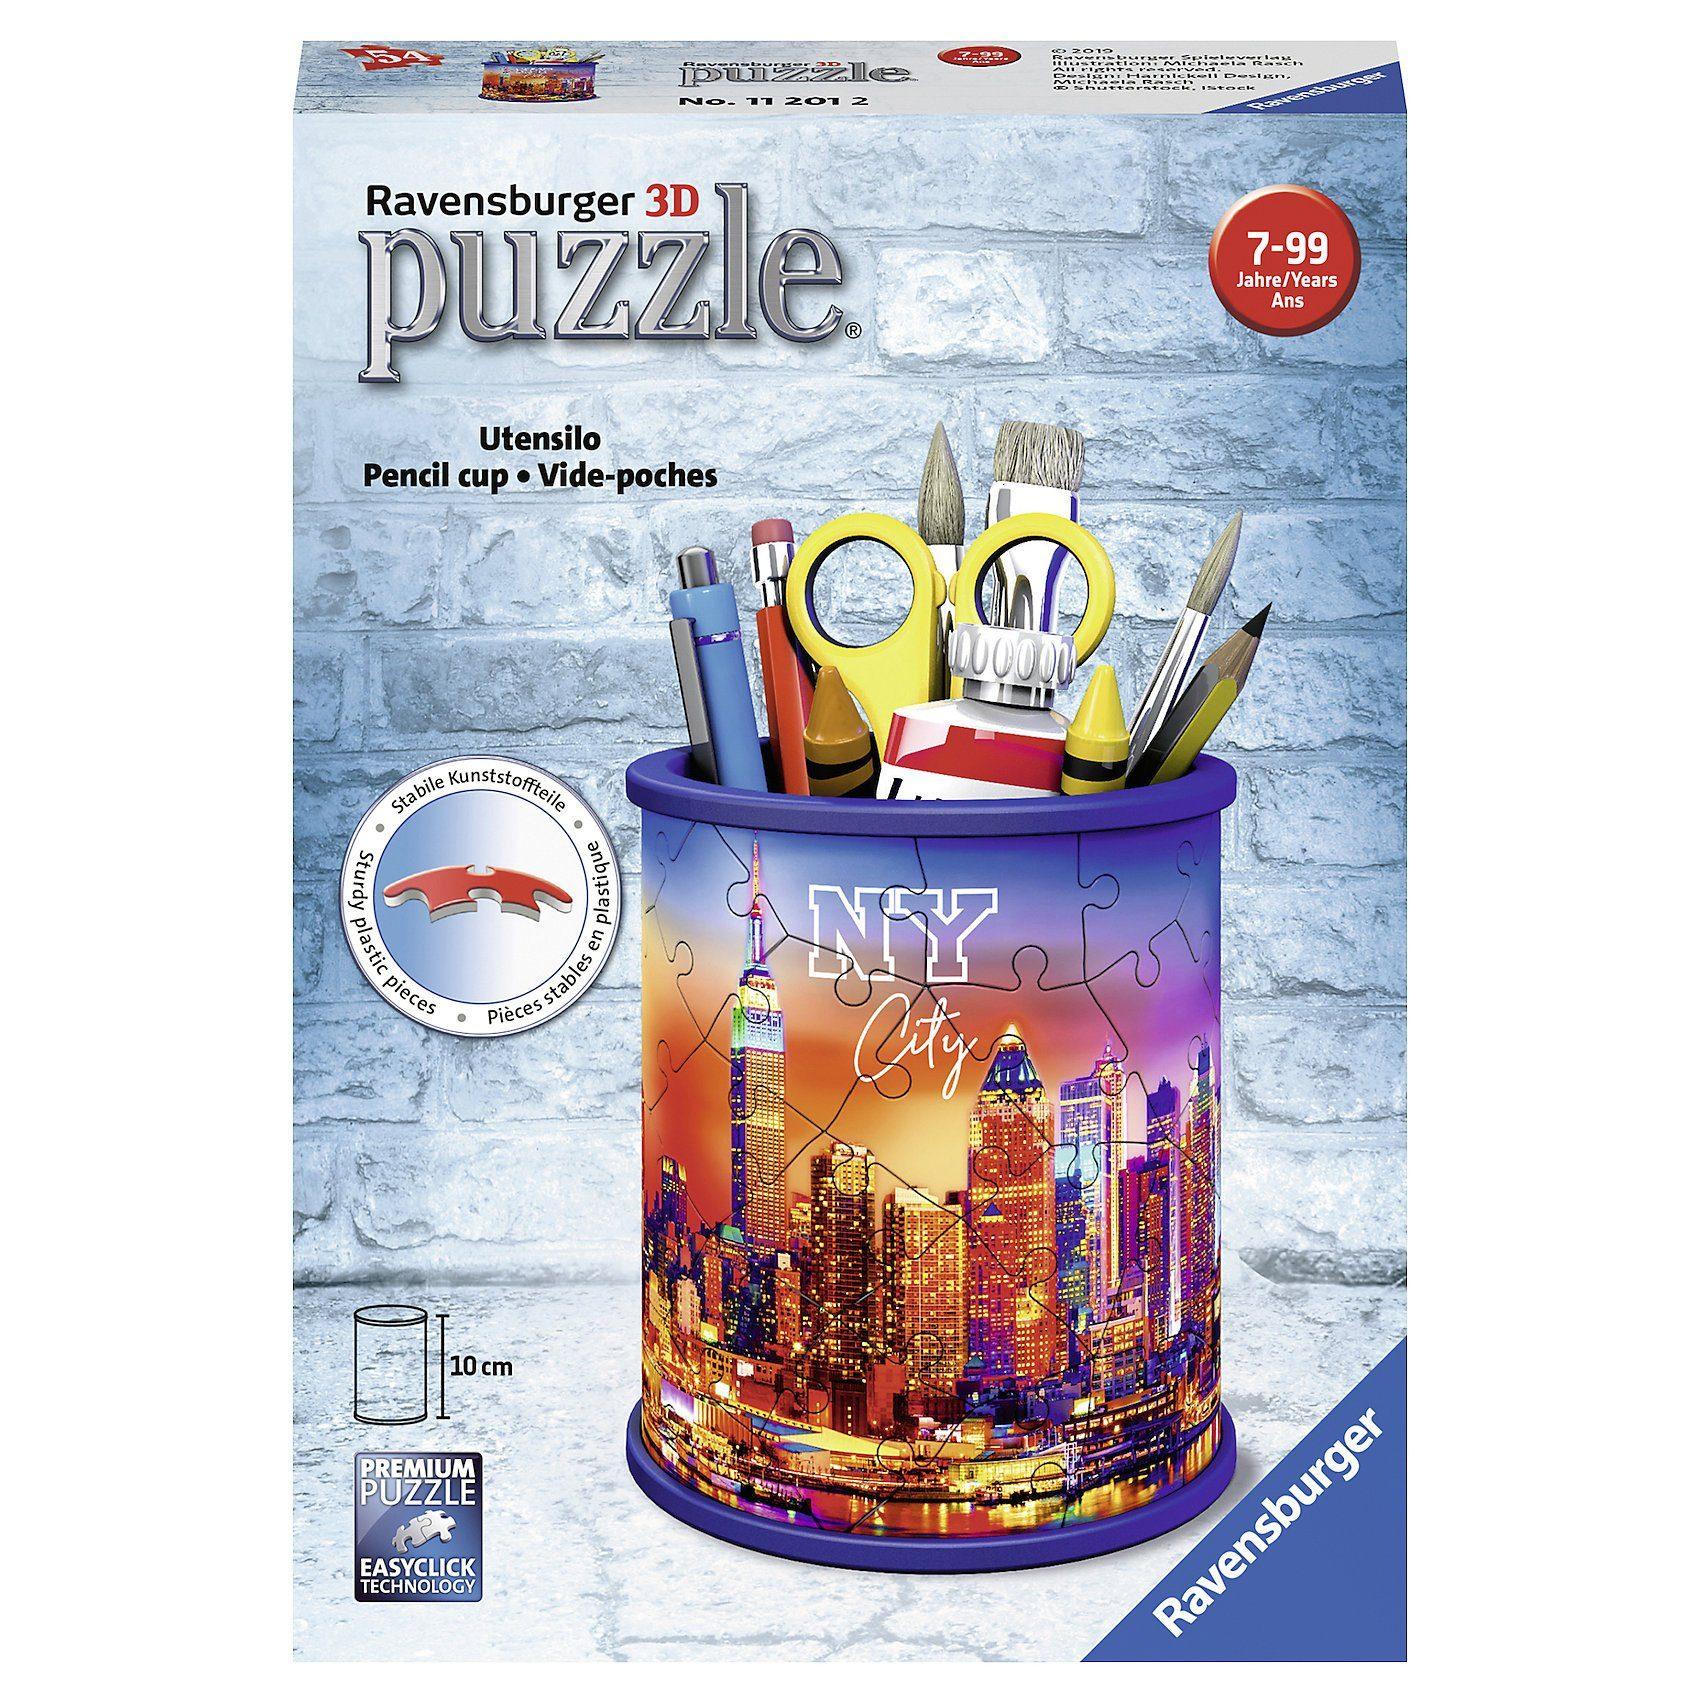 Ravensburger 3D-Puzzle Utensilo, Ø8 x 9,5 cm, 54 Teile, New York Skyline